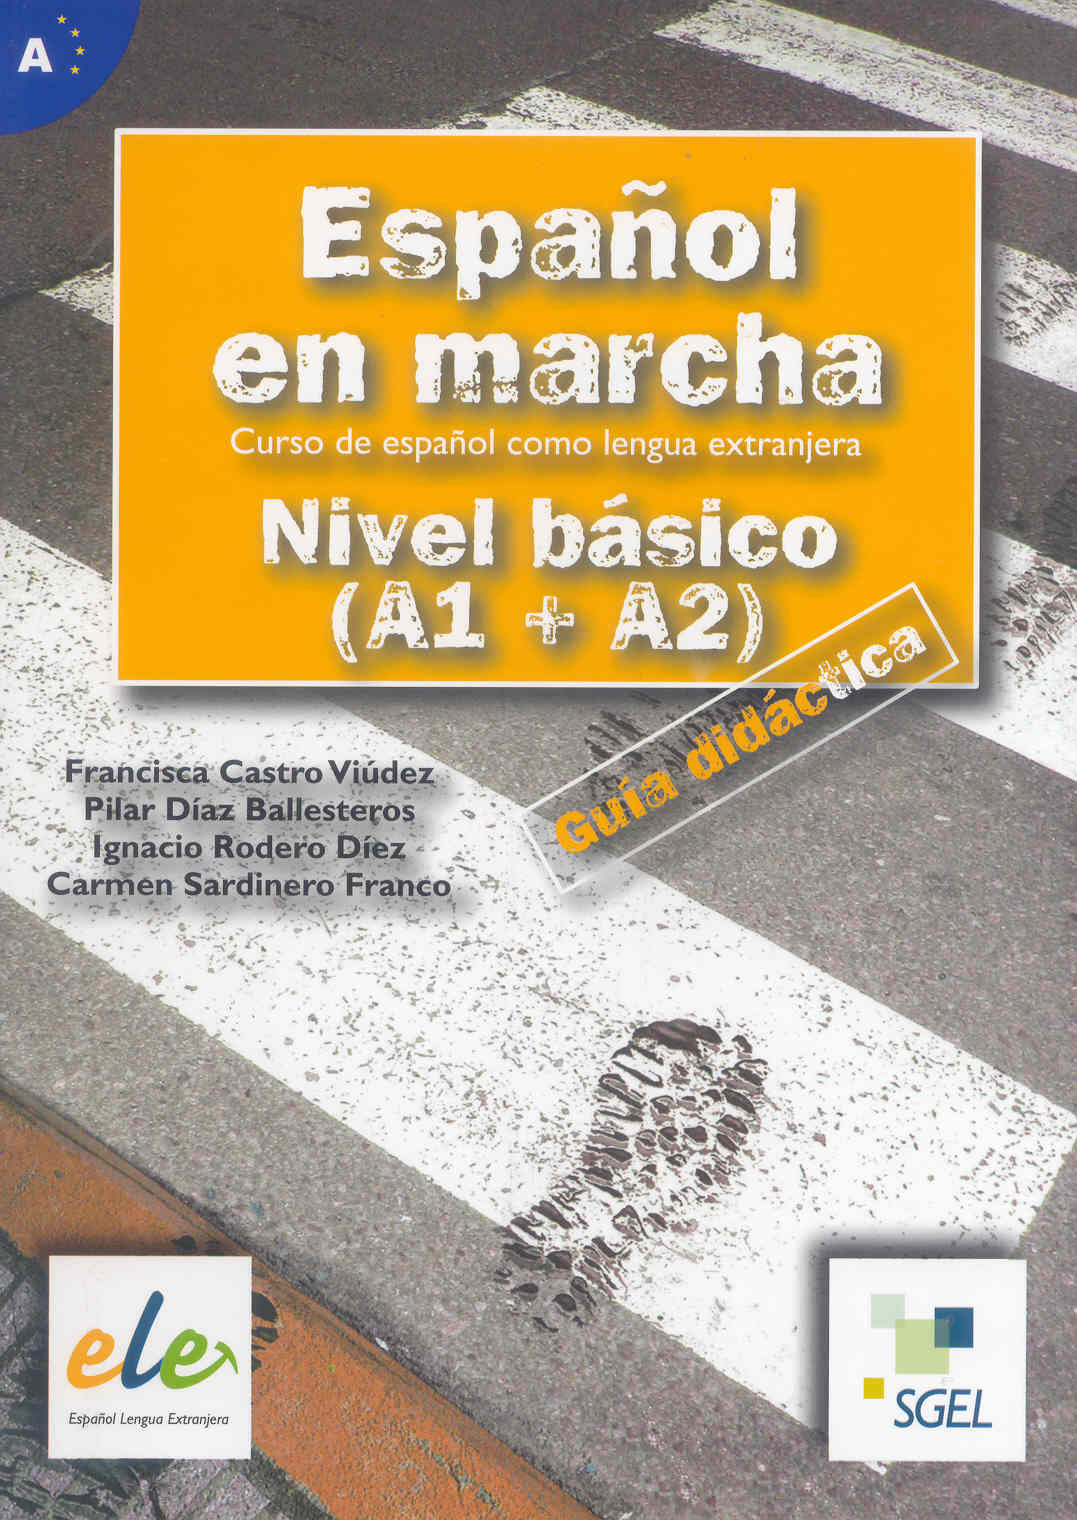 español en marcha: nivel basico (a1 + a2): guia didactica-francisca et al. castro viudez-9788497782234